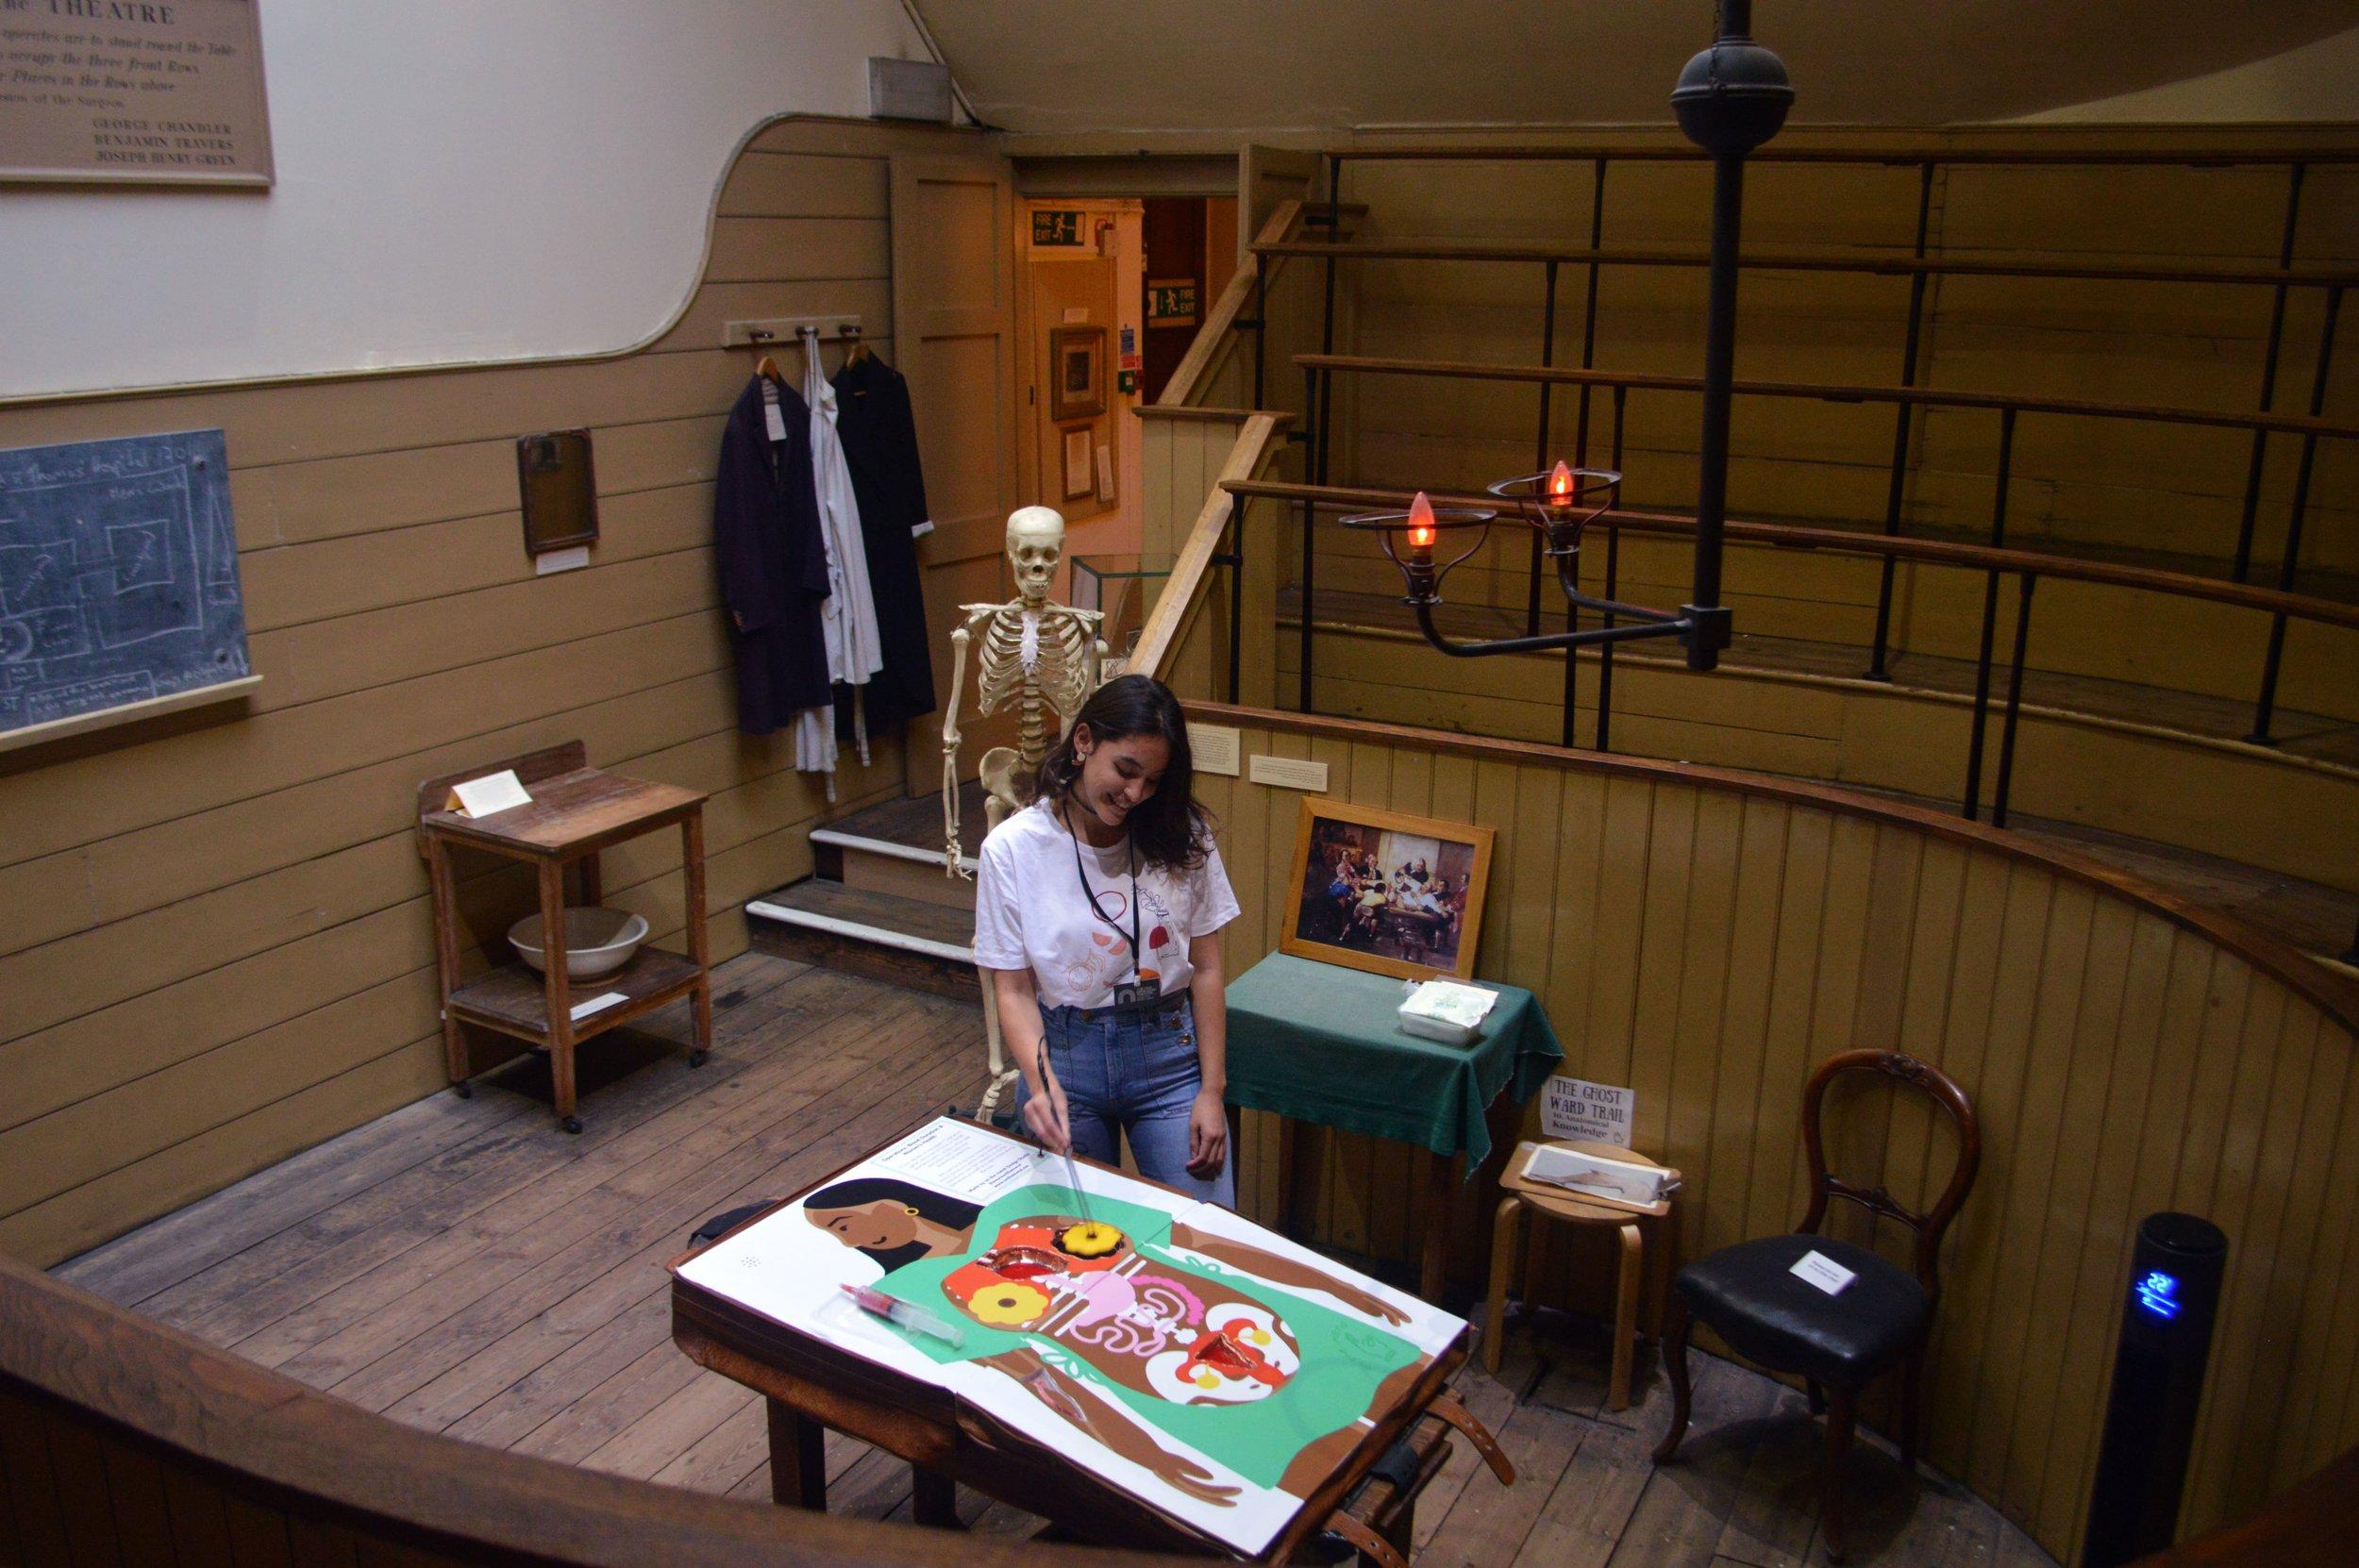 Sophia setting up operation game